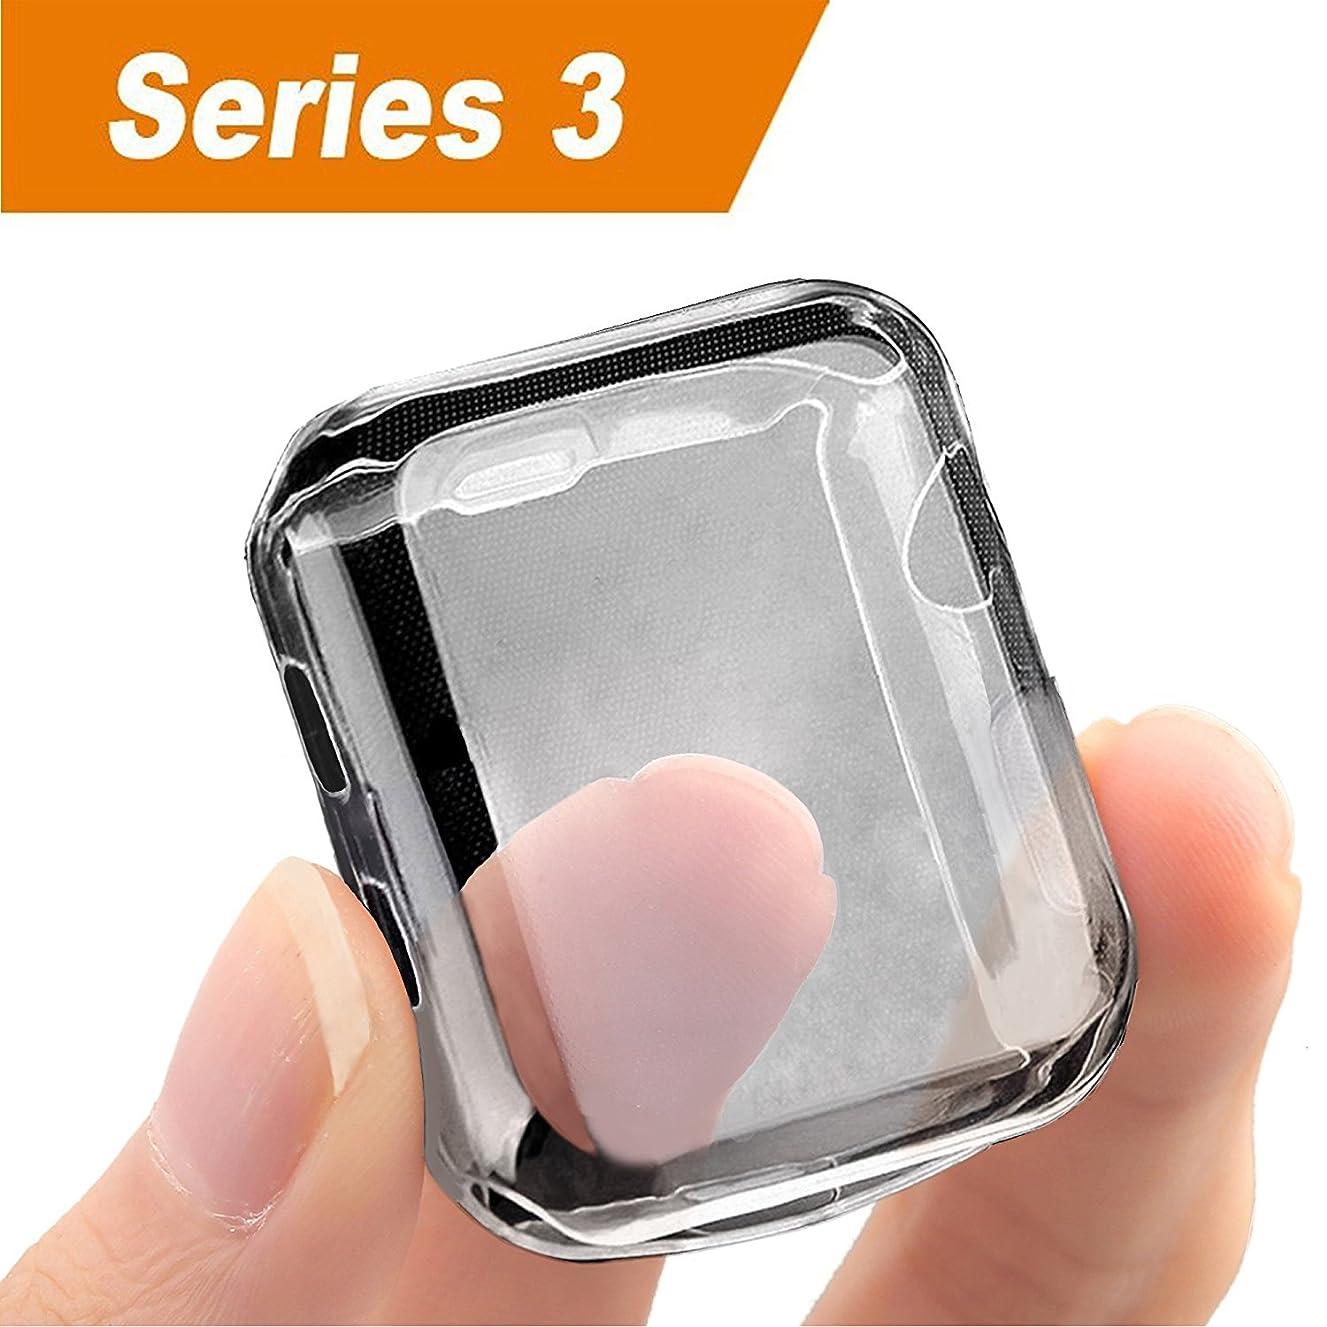 UBOLE Case for Apple Watch, UBOLE iWatch Screen Protector Soft Plated TPU All-Around Ultra-Thin Cover for Apple Watch Series 1, Series 2, Series 3, Nike+, Edition (Clear, 38mm)